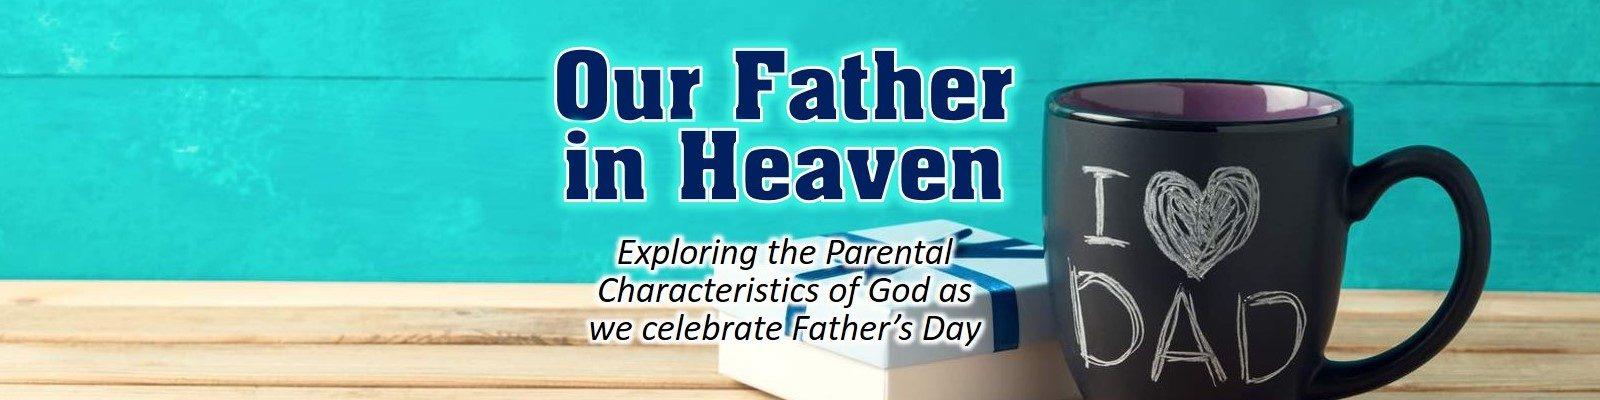 Kids Church Handout for Sunday 6 Sept